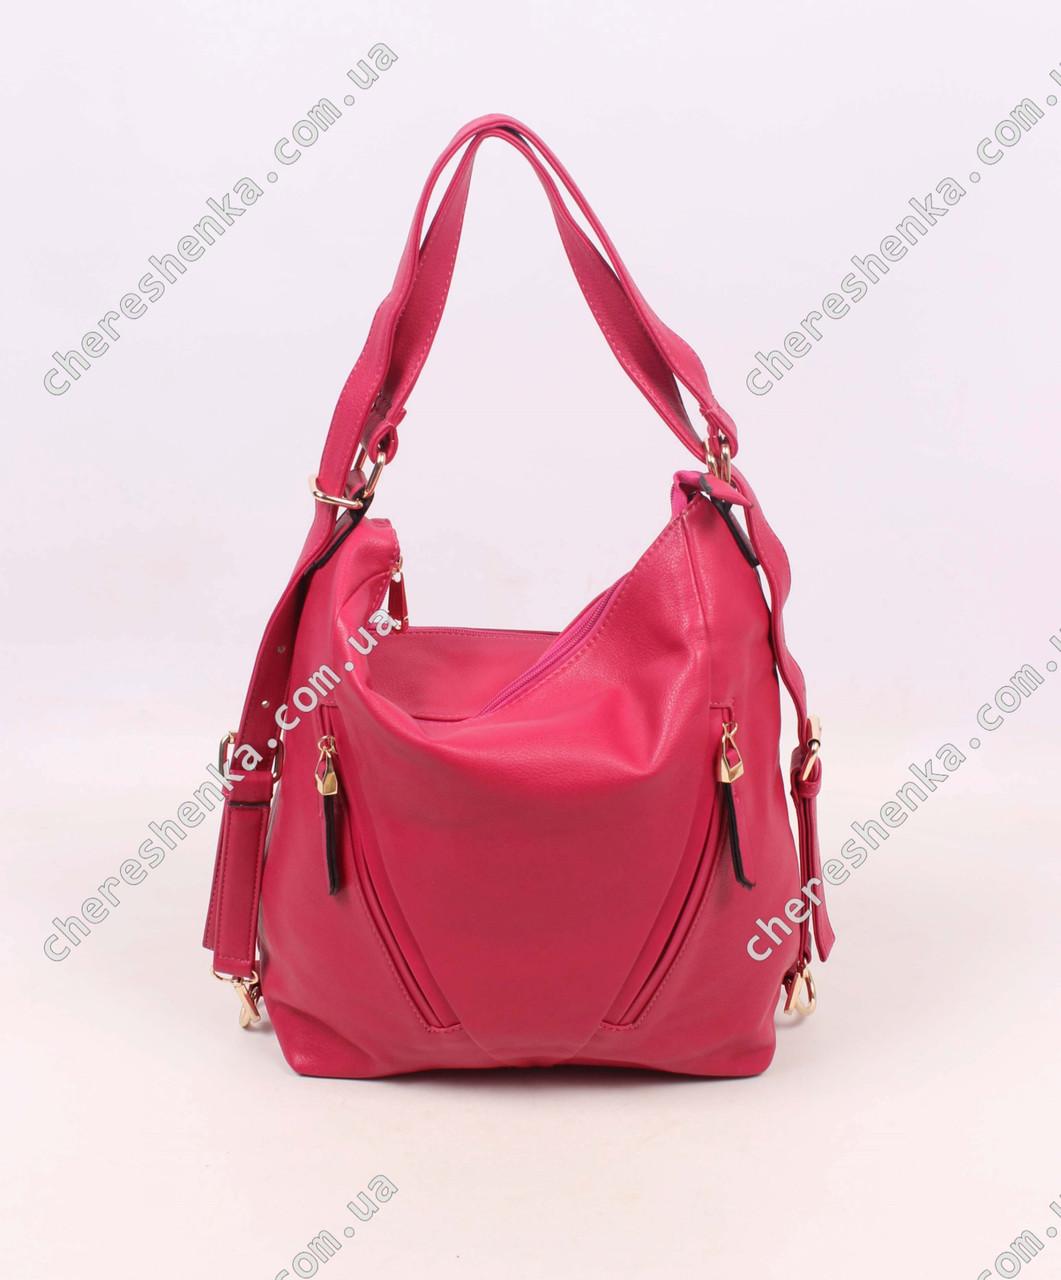 Женская сумочка M-8007-A